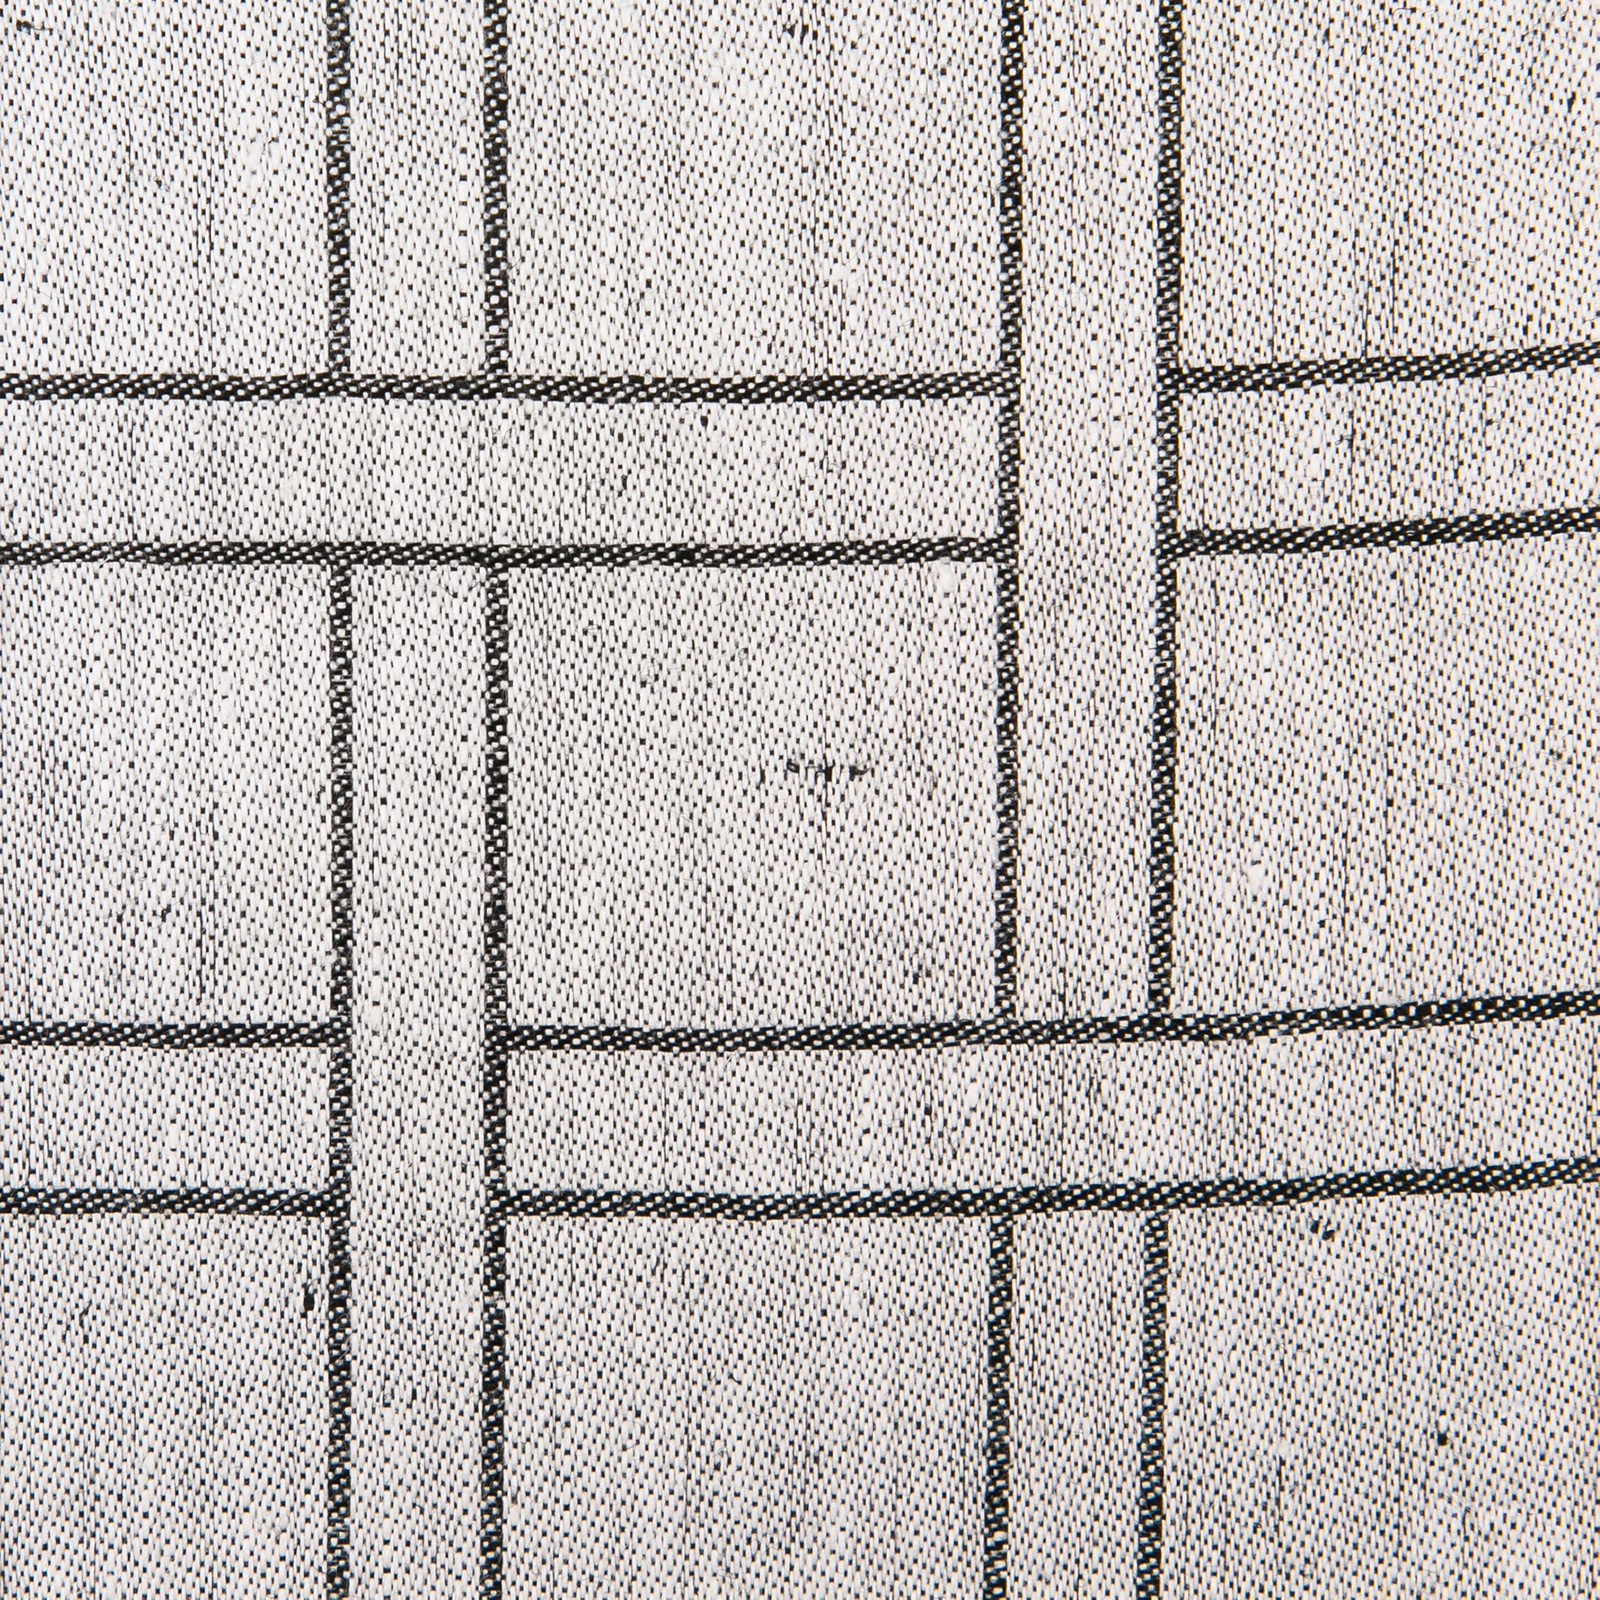 Flätan linne duk Klässbols Linneväveri Peter Condu beige svart